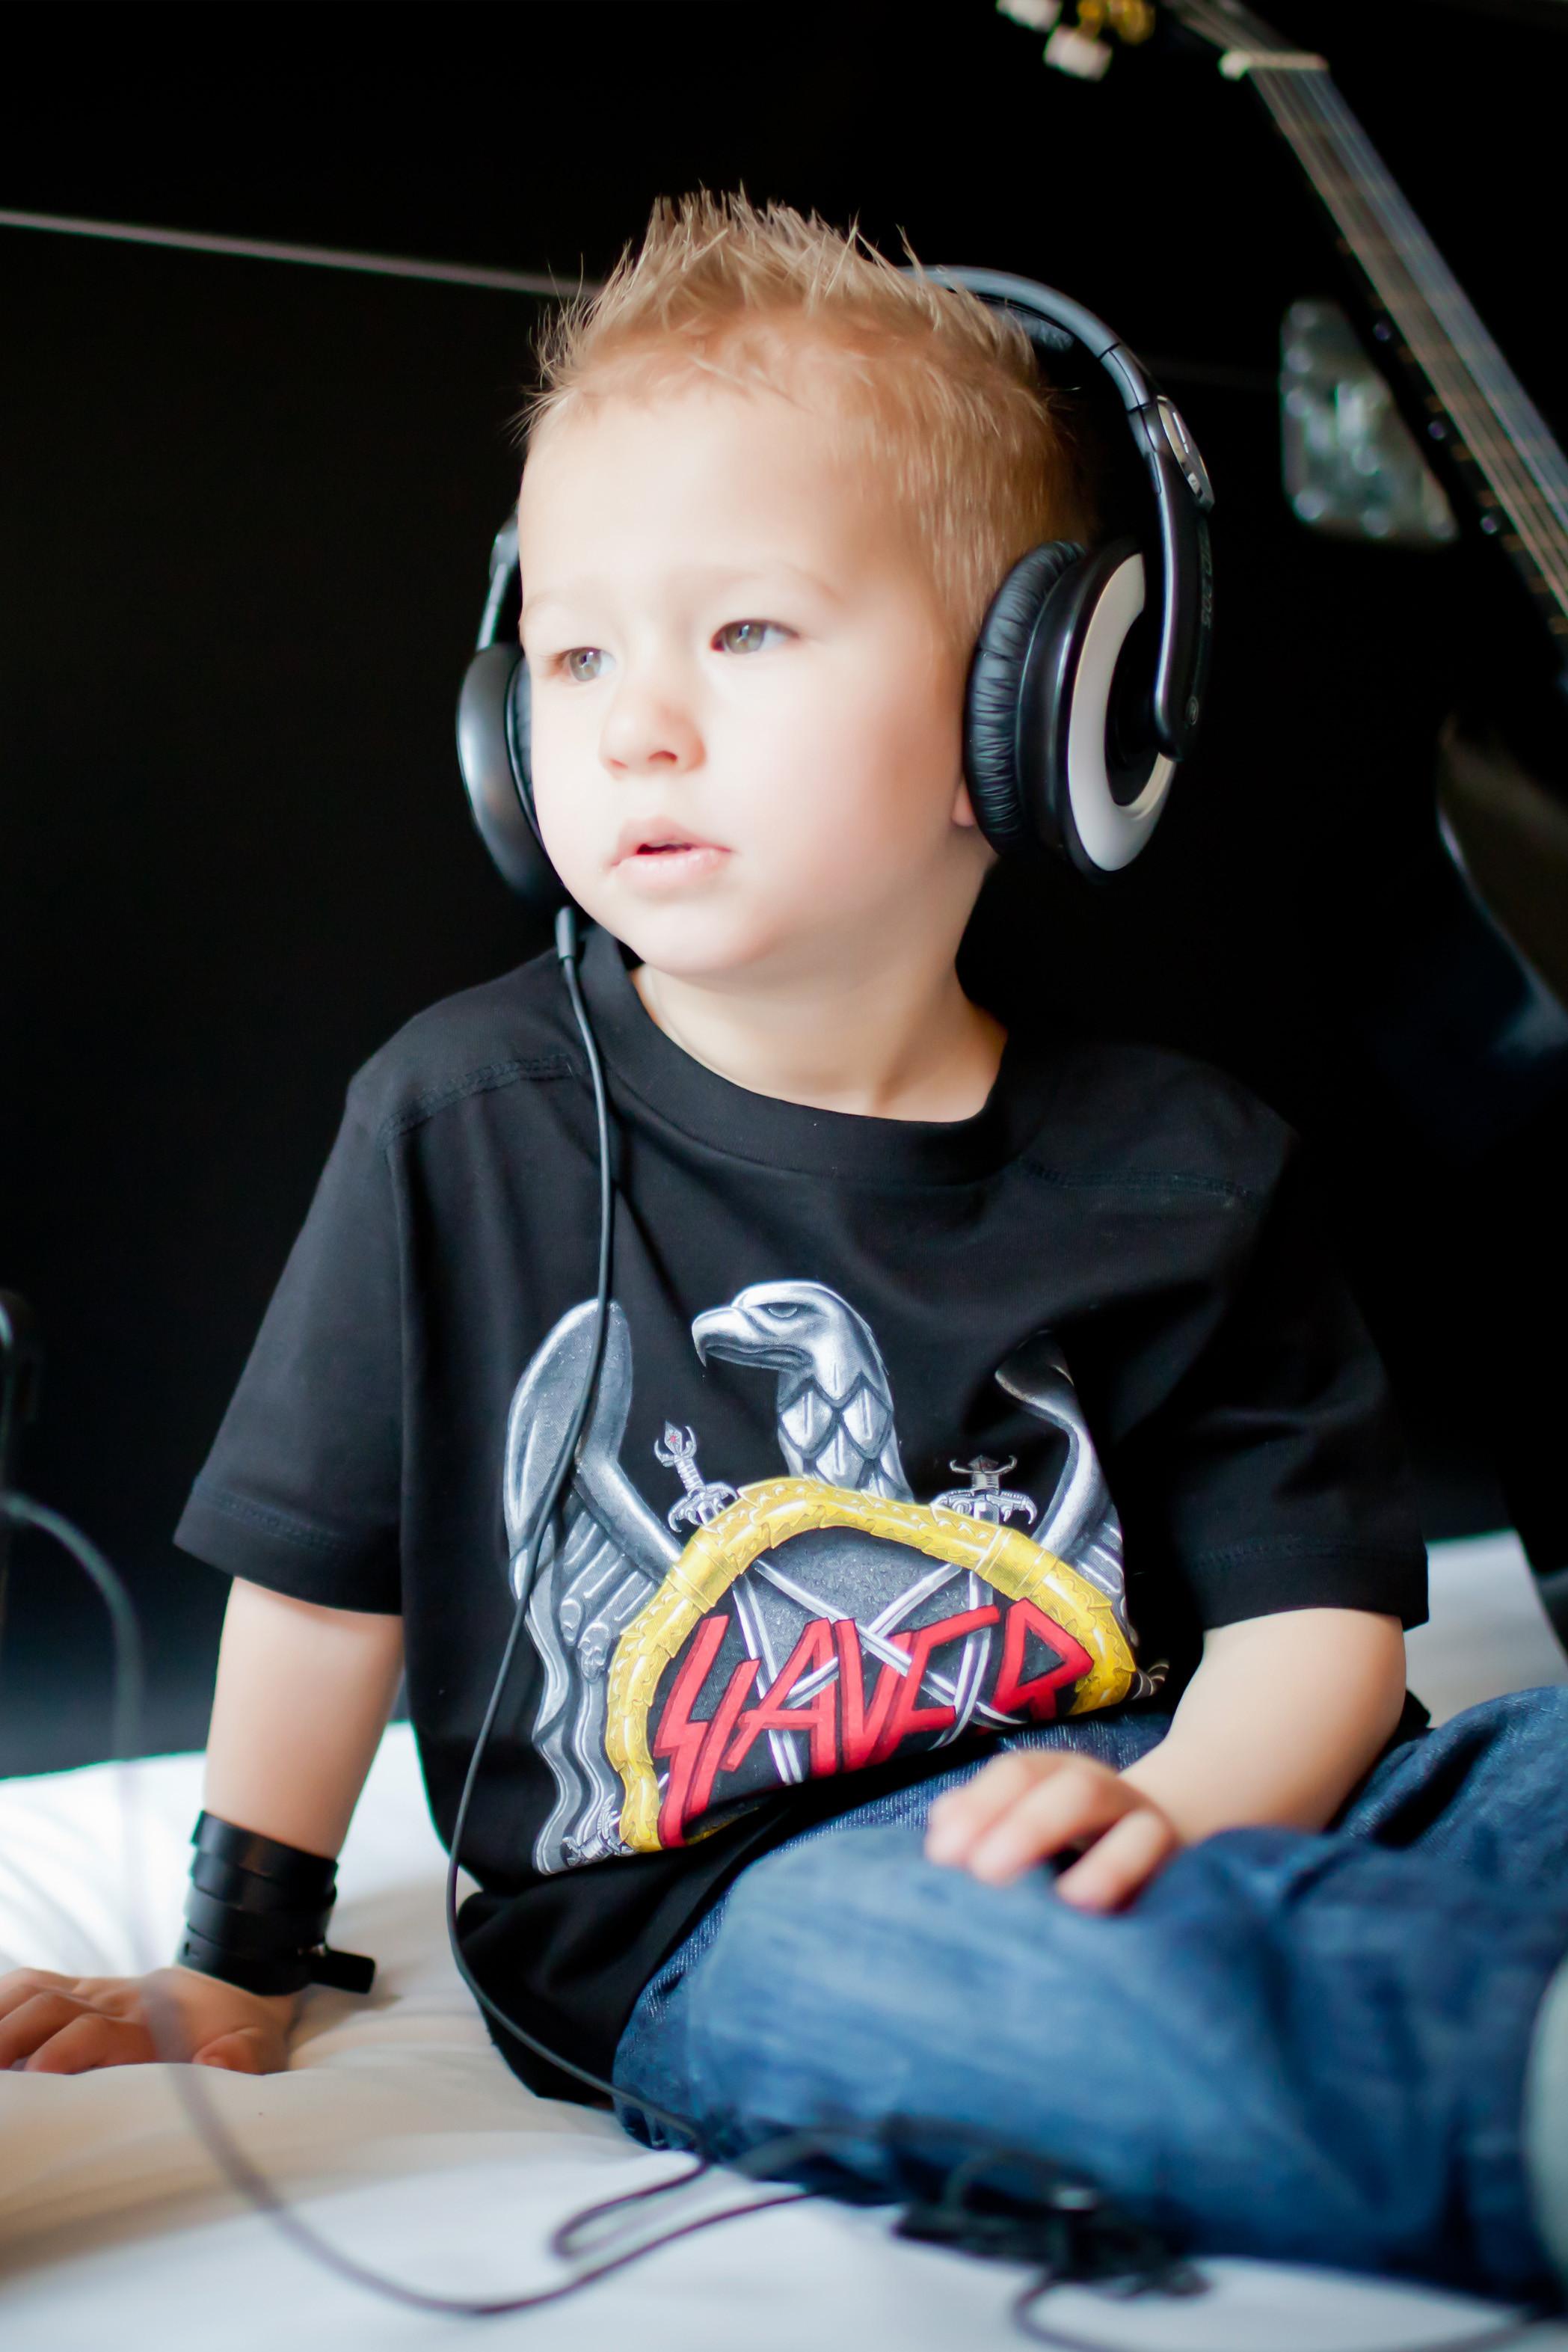 Slayer children band merchandise Silver Eagle